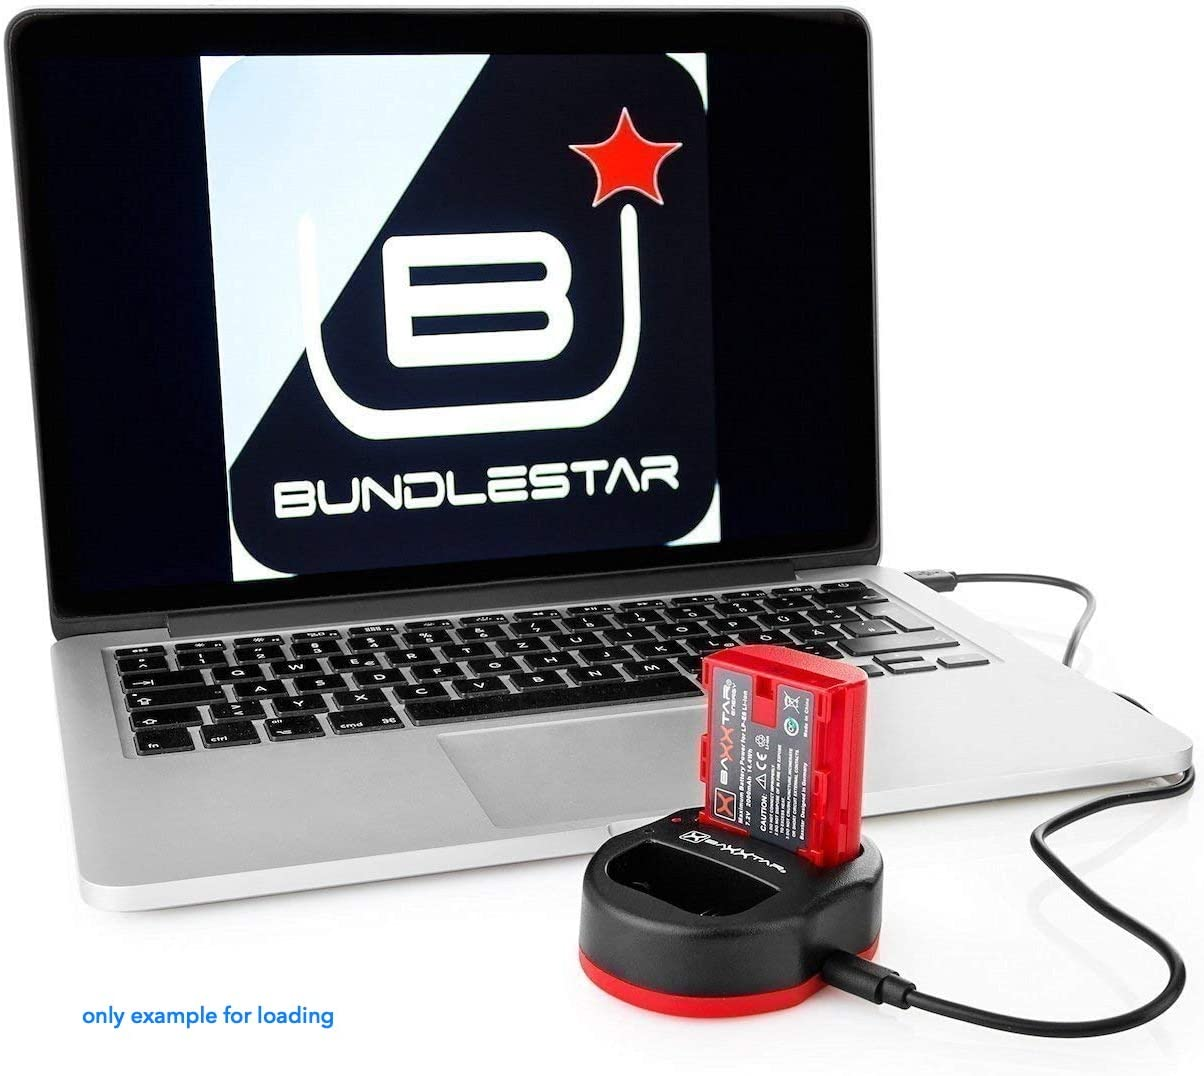 und USB Dual Ladeger/ät DSC HX90 HX95 HX99 RX100 WX350 HX400V HDR AS100V FDR X1000 X3000 usw Baxxtar Set echte 1090mAh 2X Ersatz f/ür Akku Sony NP-BX1